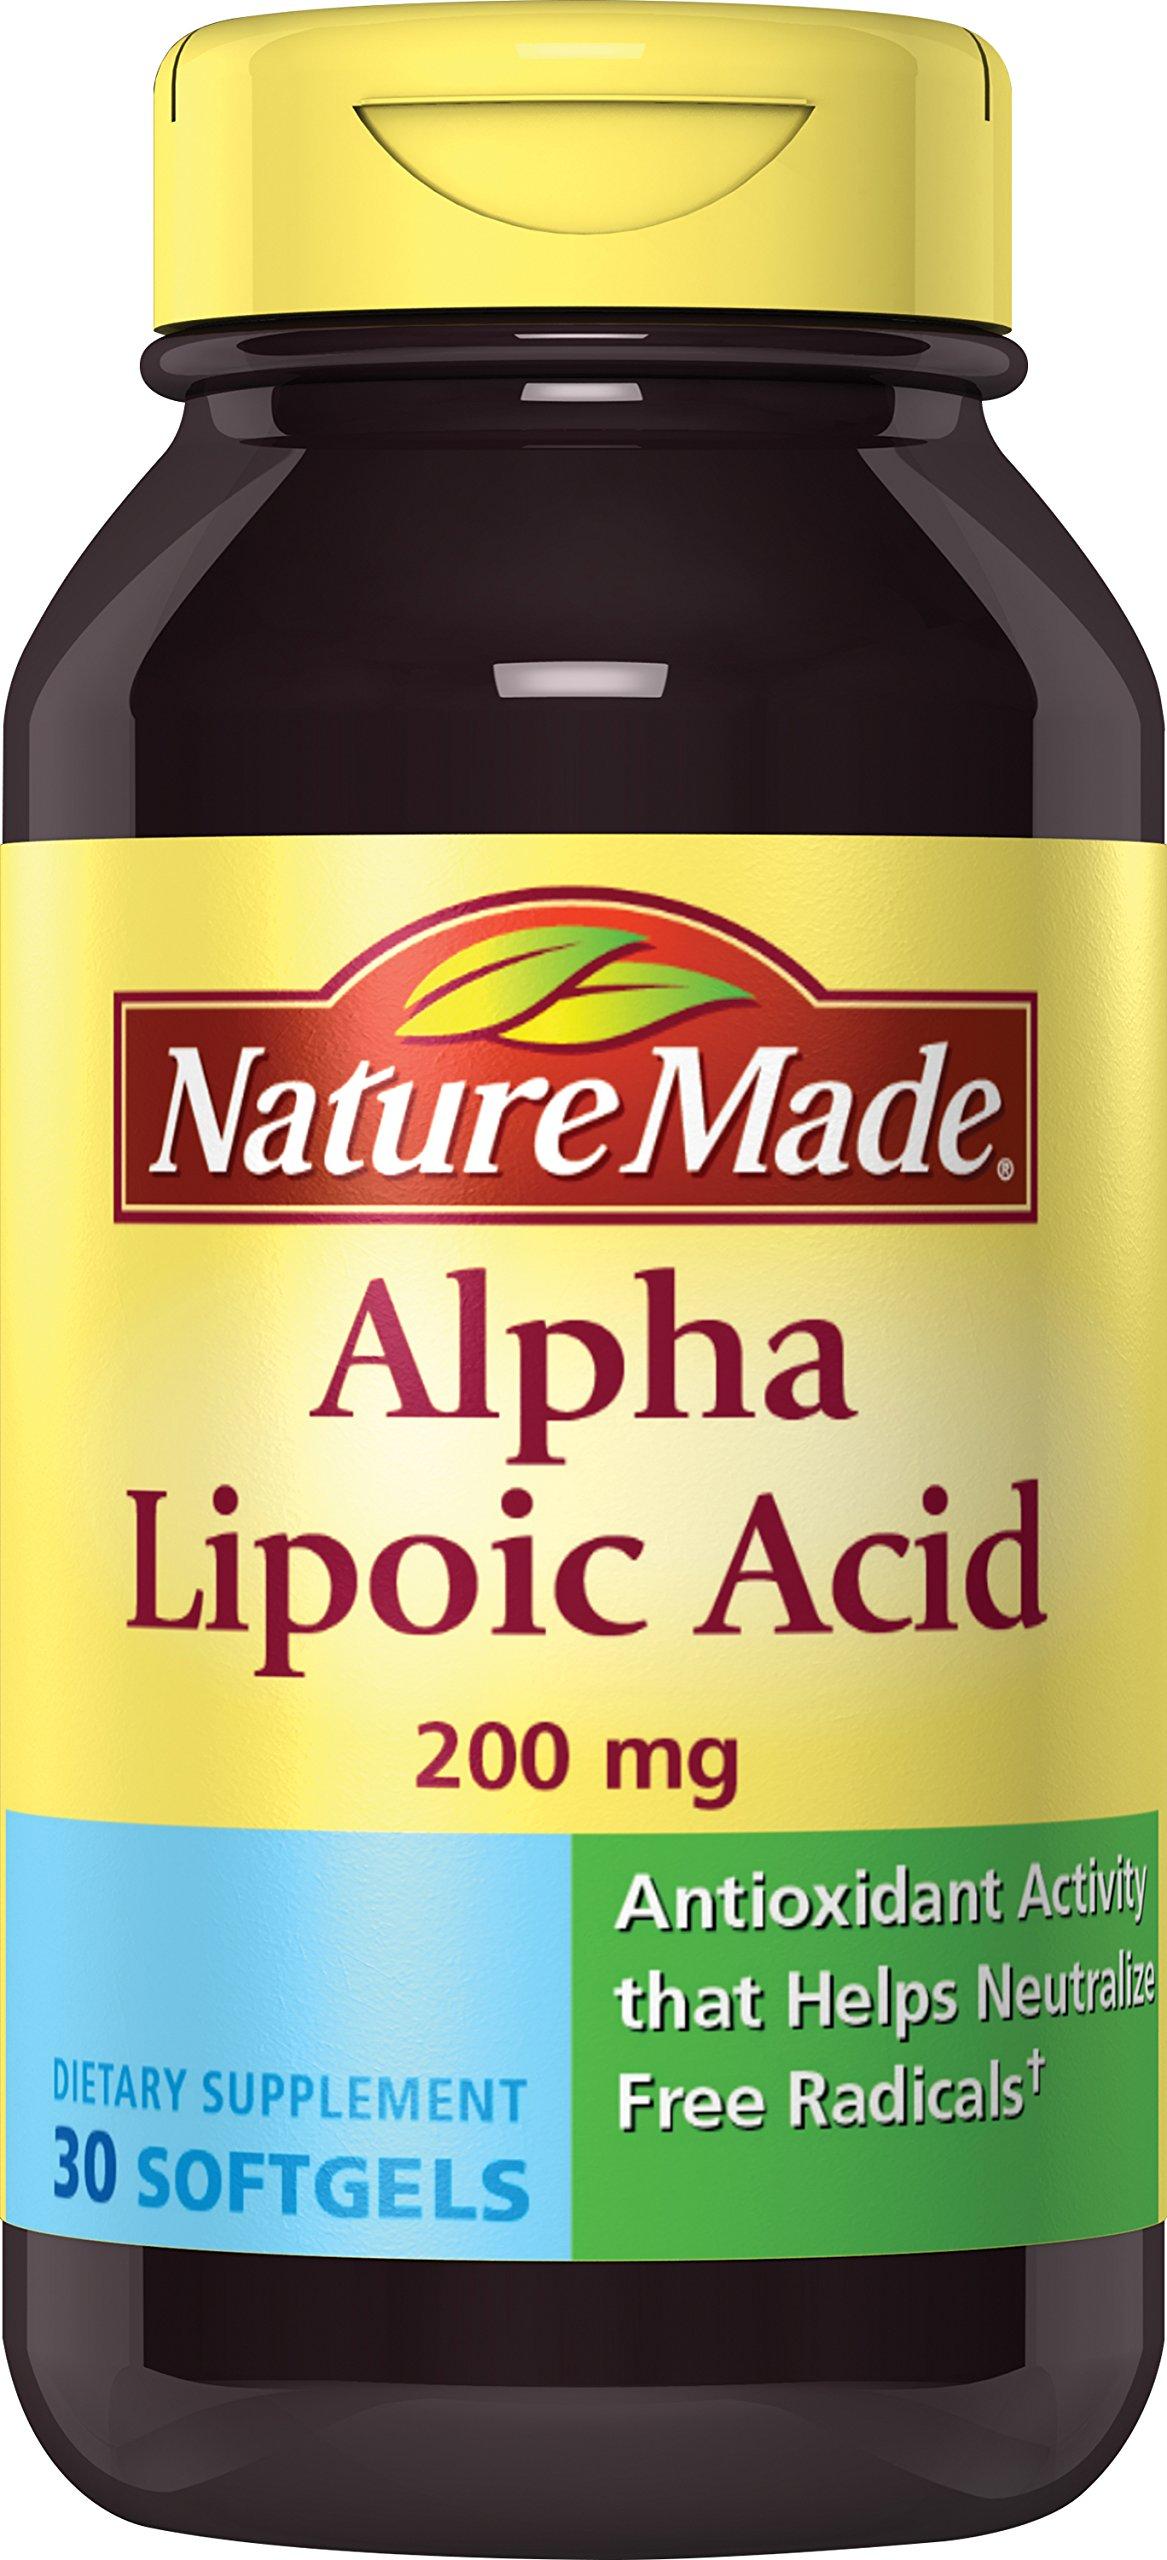 Nature Made Alpha Lipoic Acid (Antioxidant) 200 mg. Softgels 30 Ct